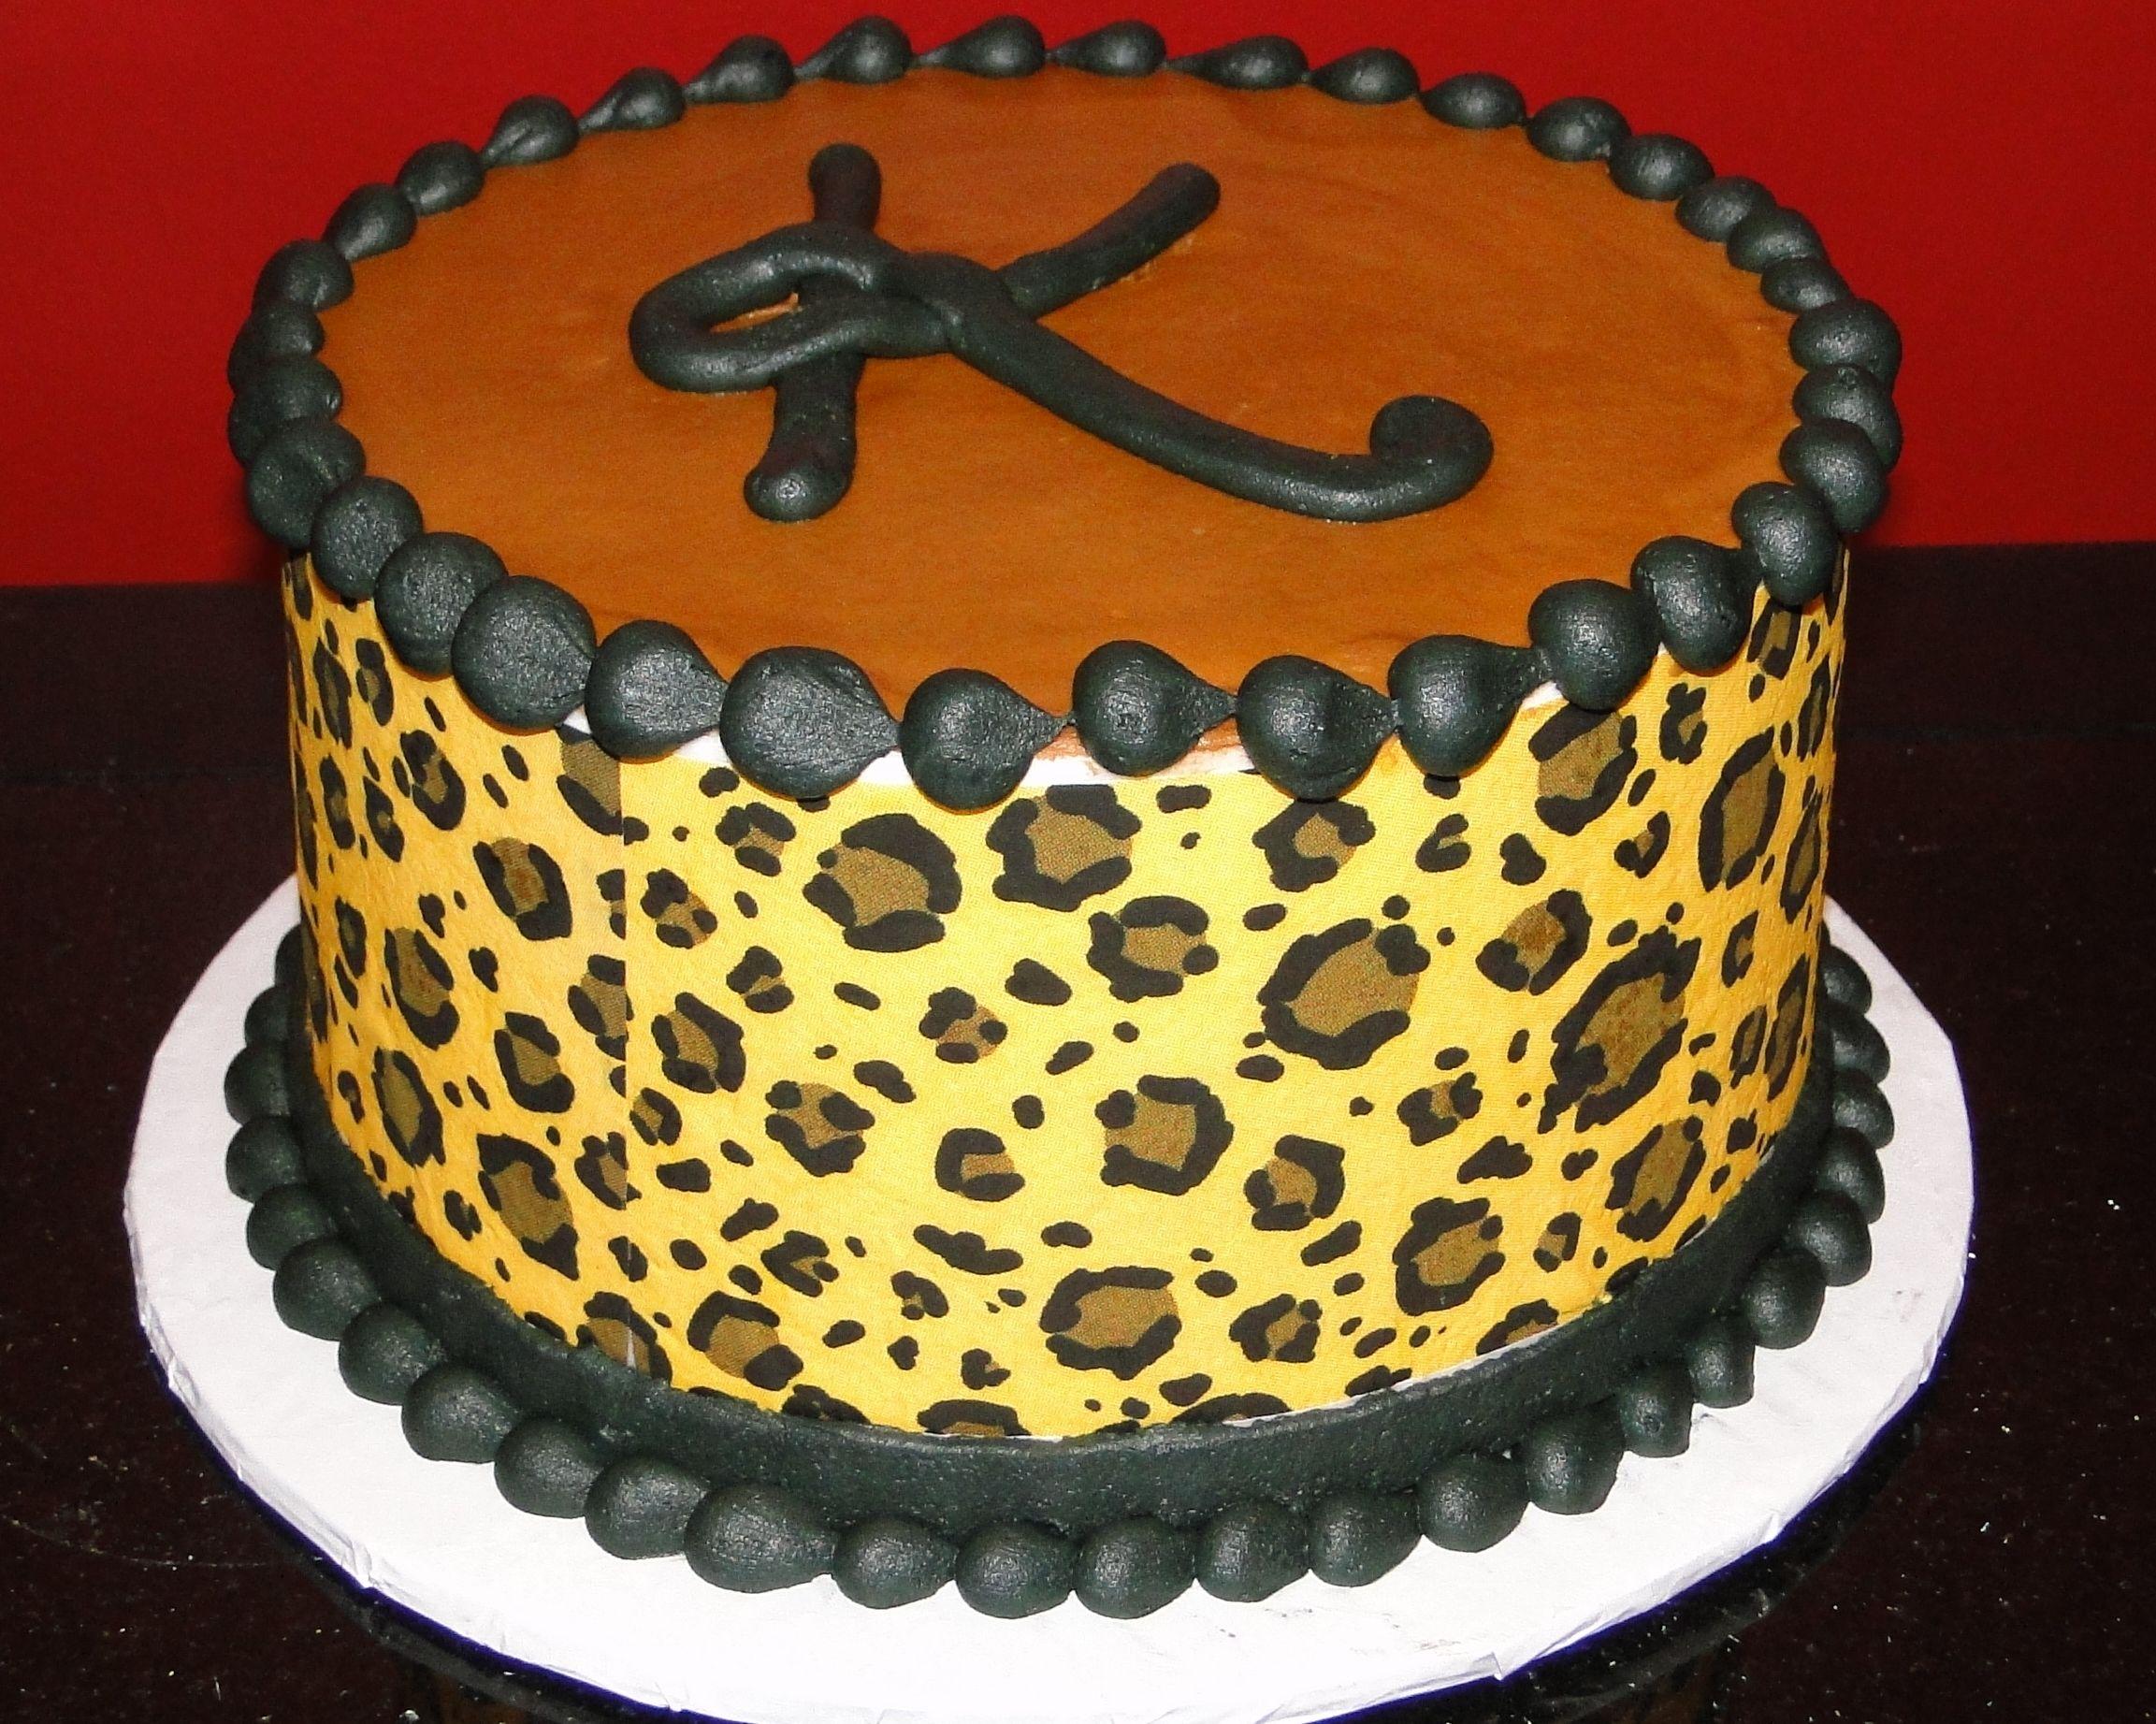 Remarkable Cheetah Birthday Cakes Cake To Go Birthday Cheetah Print Funny Birthday Cards Online Benoljebrpdamsfinfo